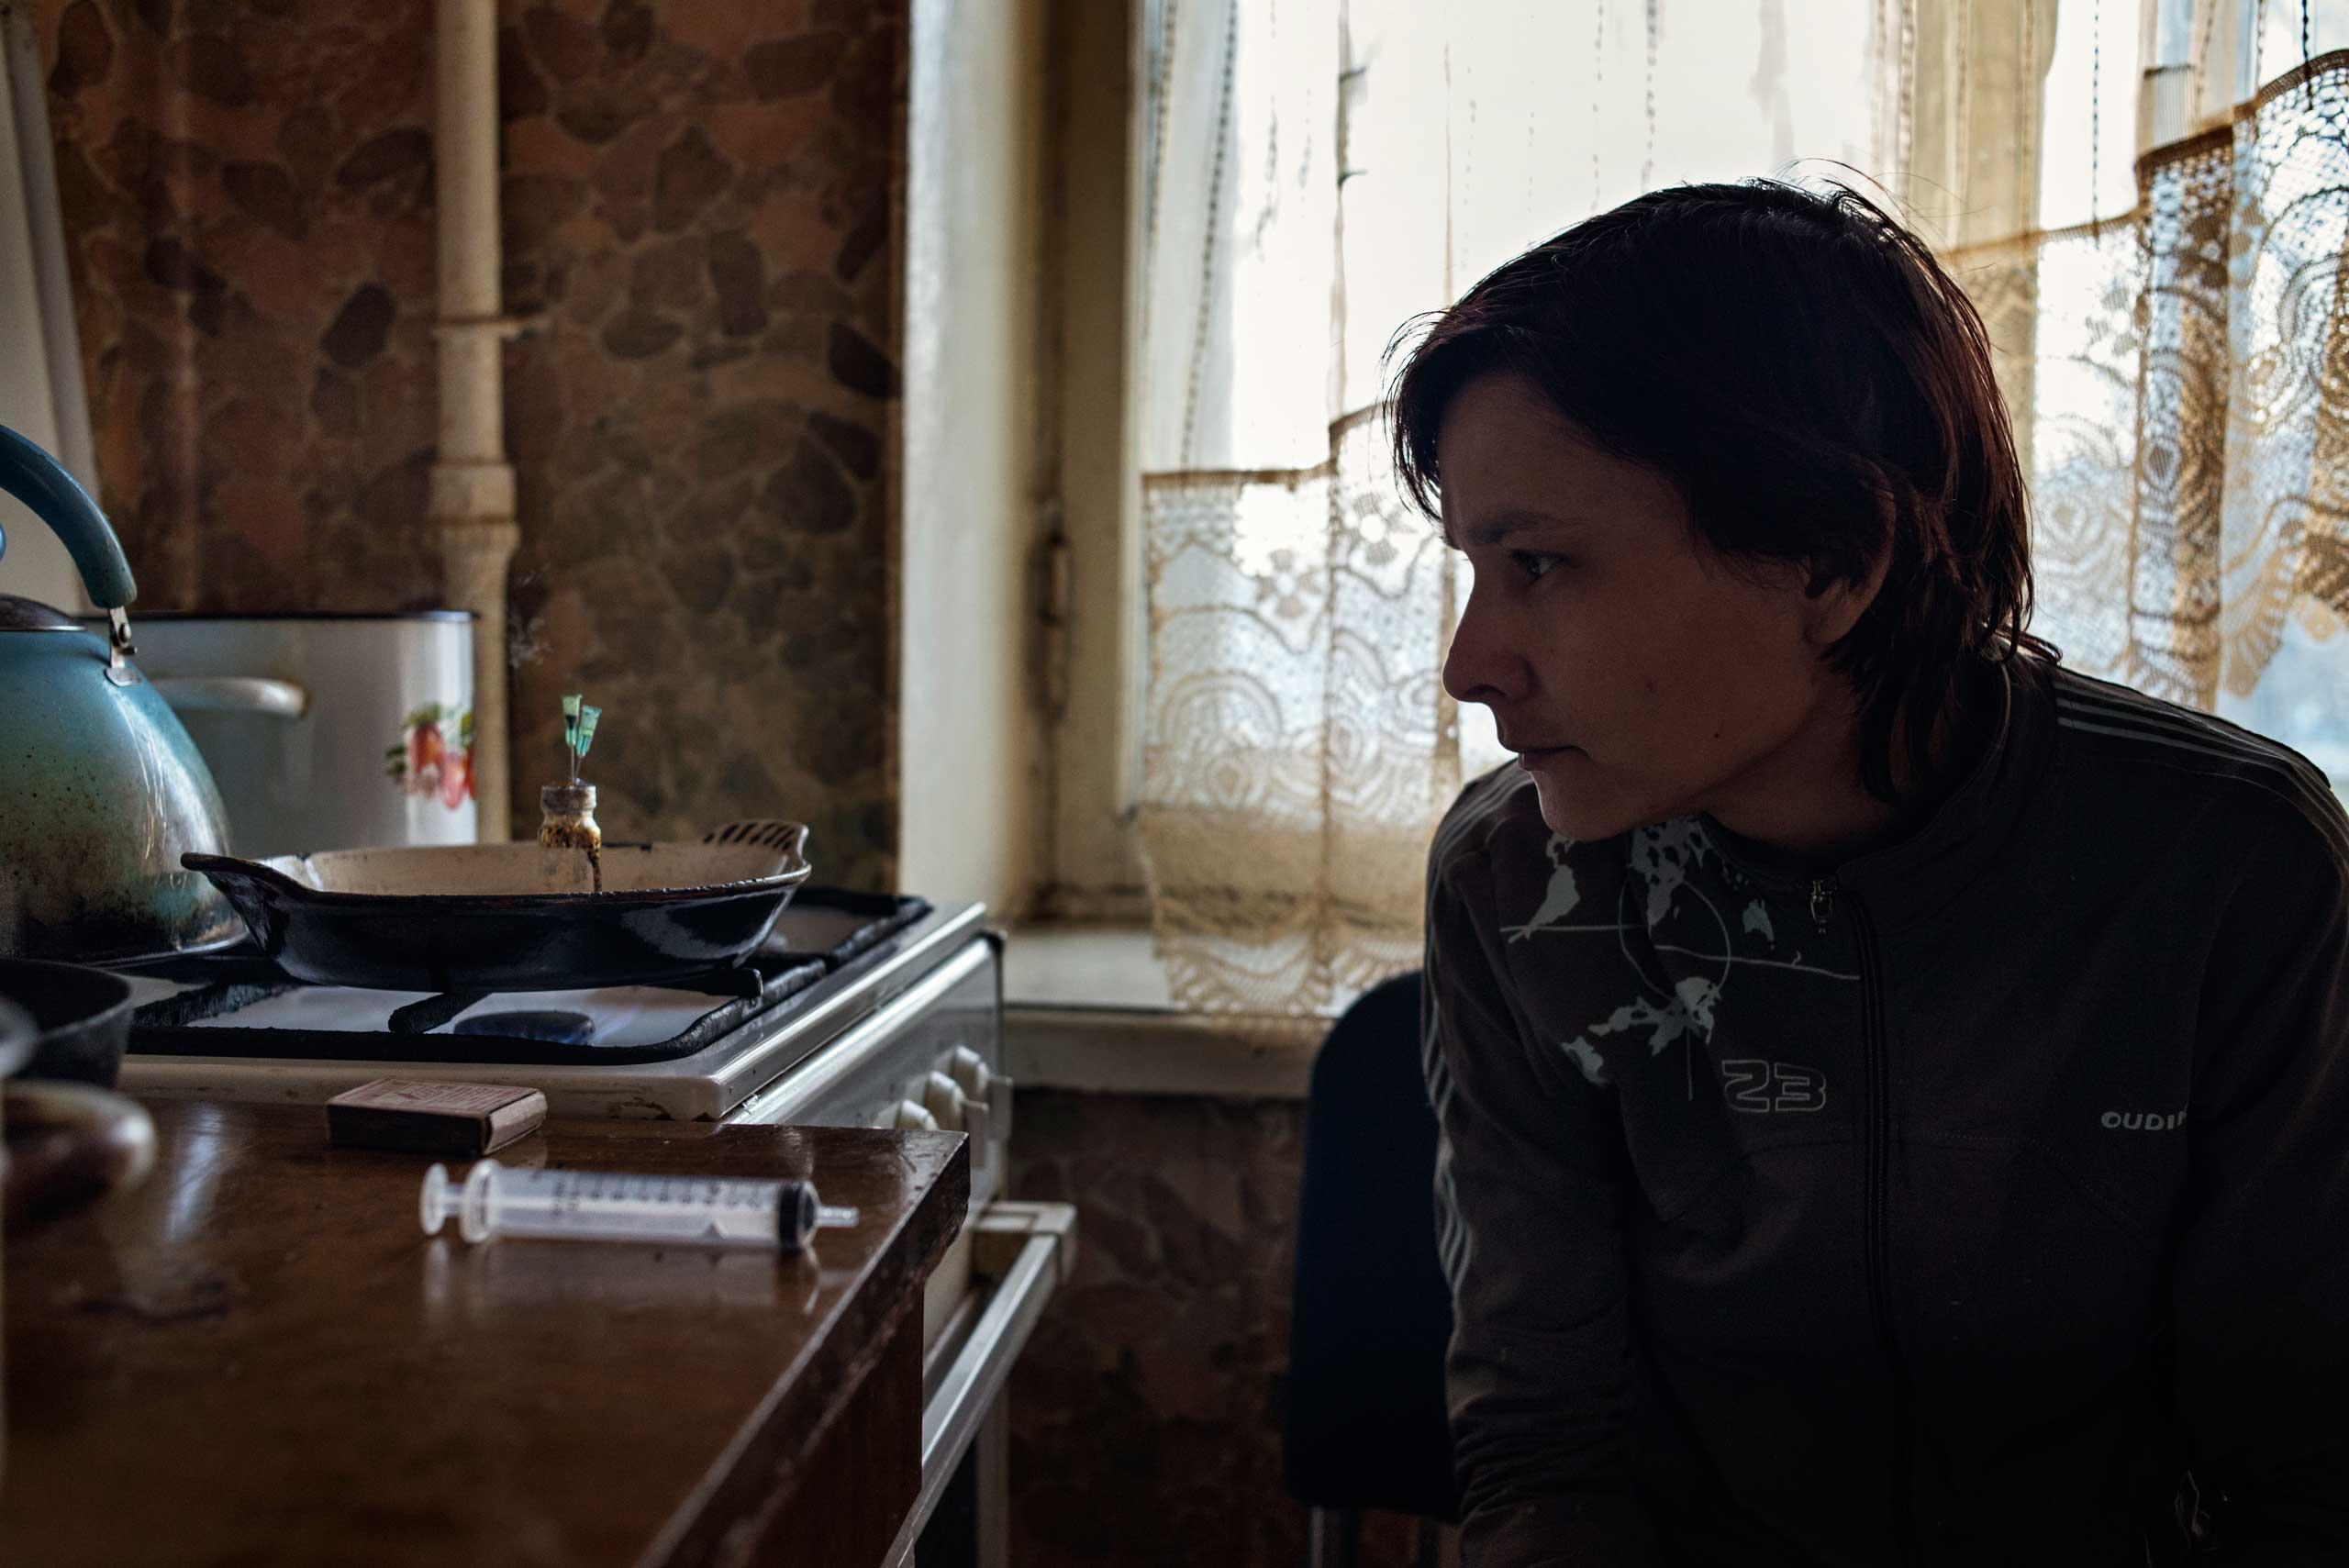 Oxana, 33 years old, cooks krokodil.